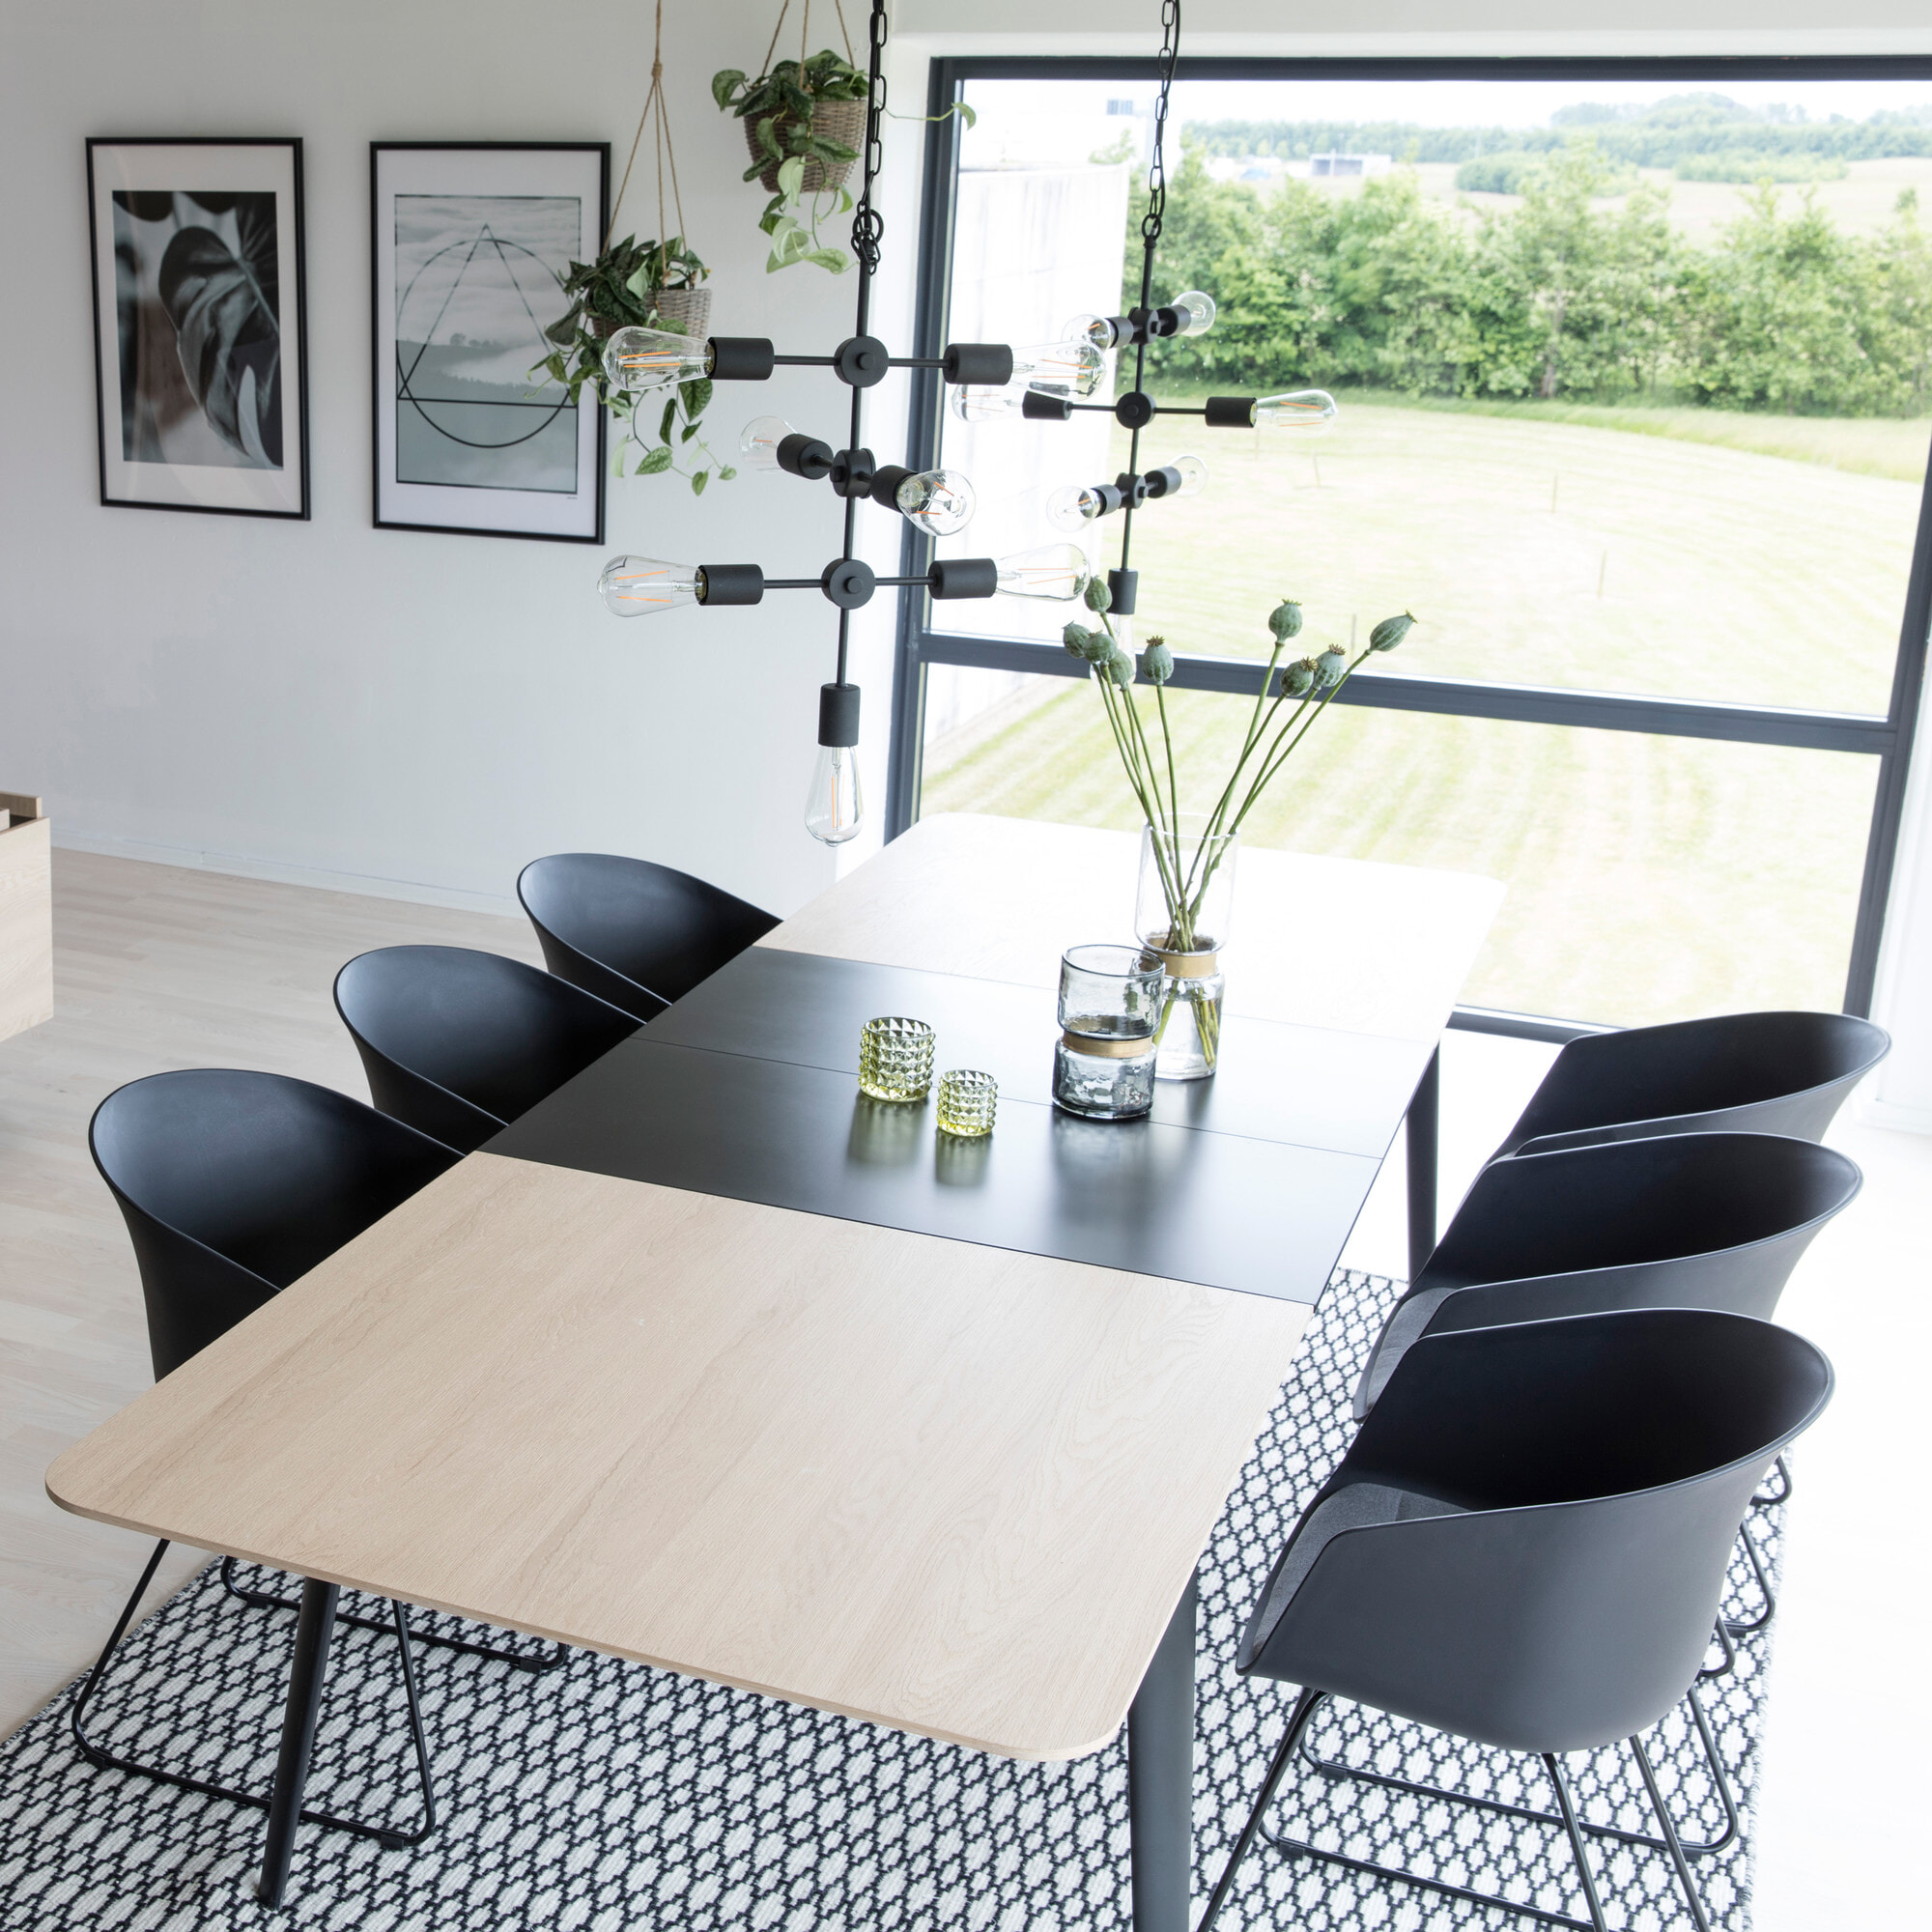 Interstil Eettafel Connect, 200 x 100cm